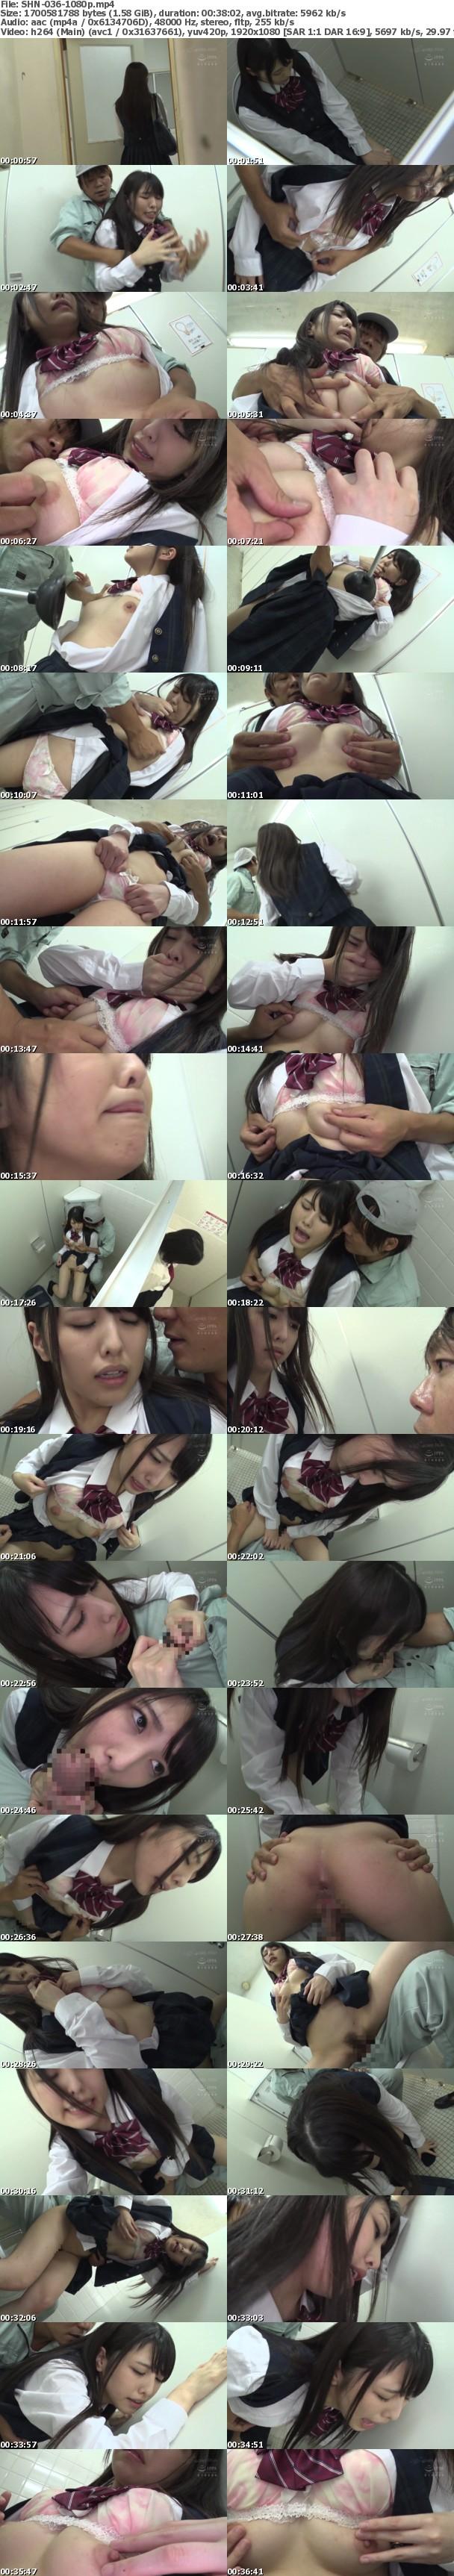 (Full HD) SHN-036 密室で乳首をいじられ失禁イキ発情SEX トイレでハメるスリルに酔う黒髪少女